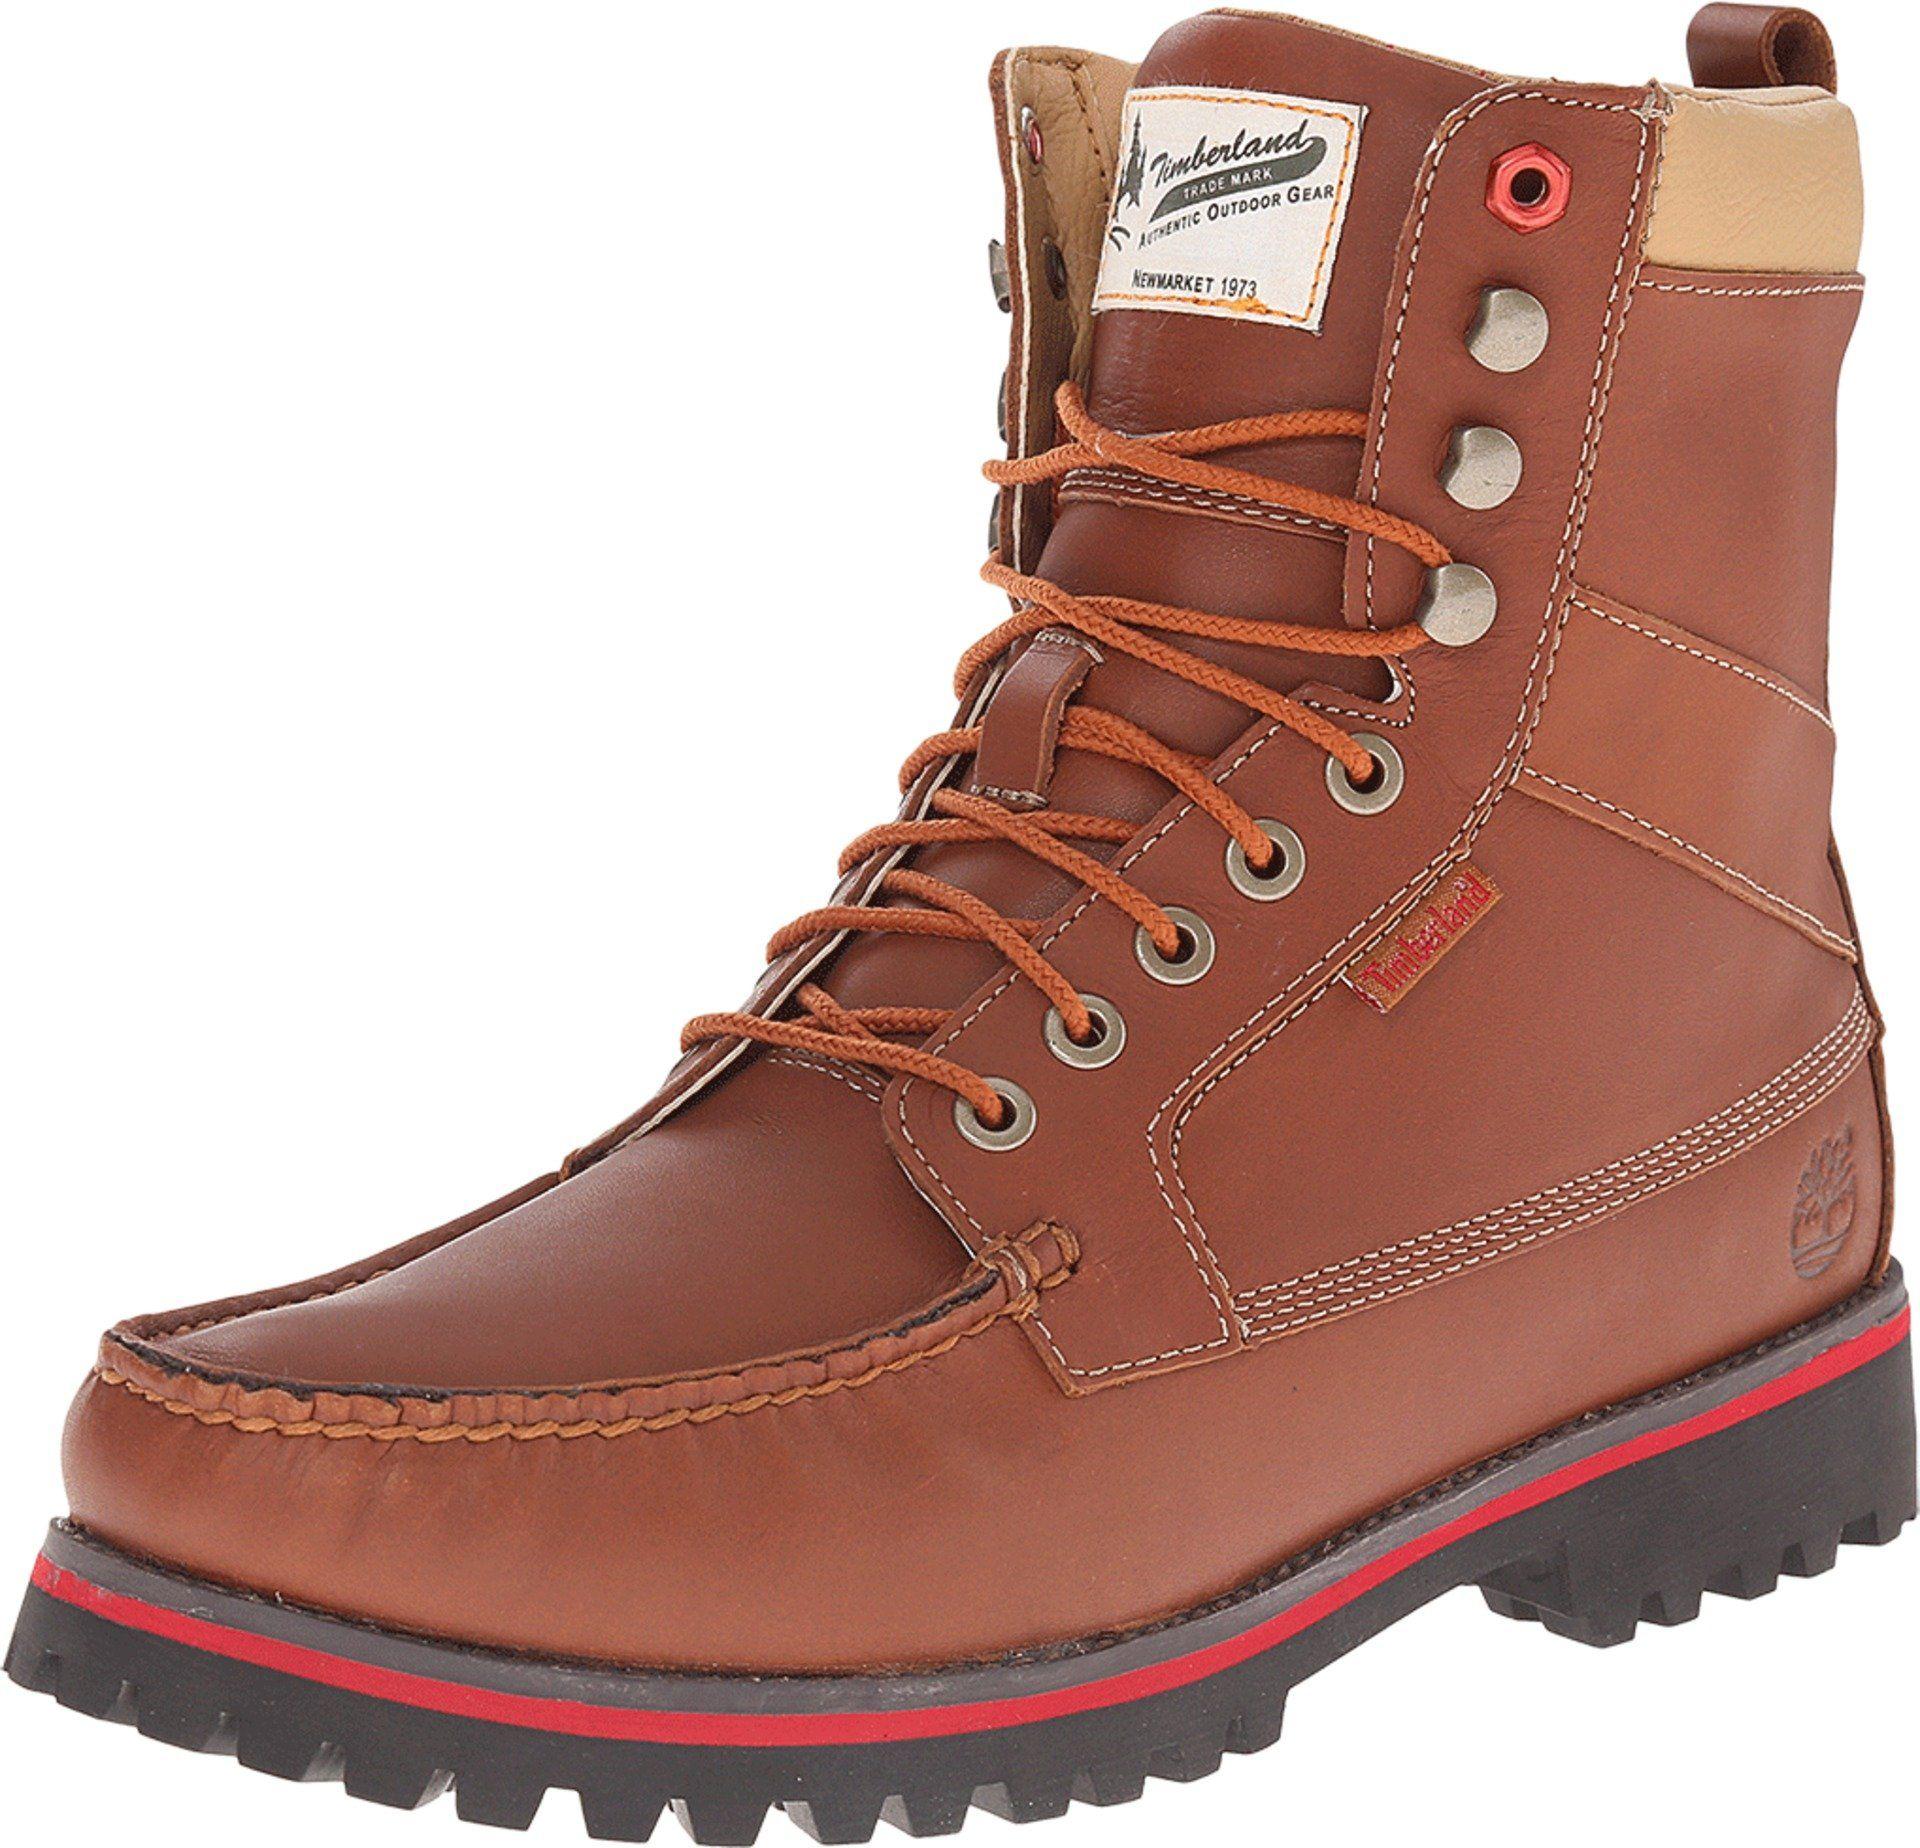 Timberland Boot Company Men's 9 Eye Moc Toe Boot Light Brown Boot 11 D (M